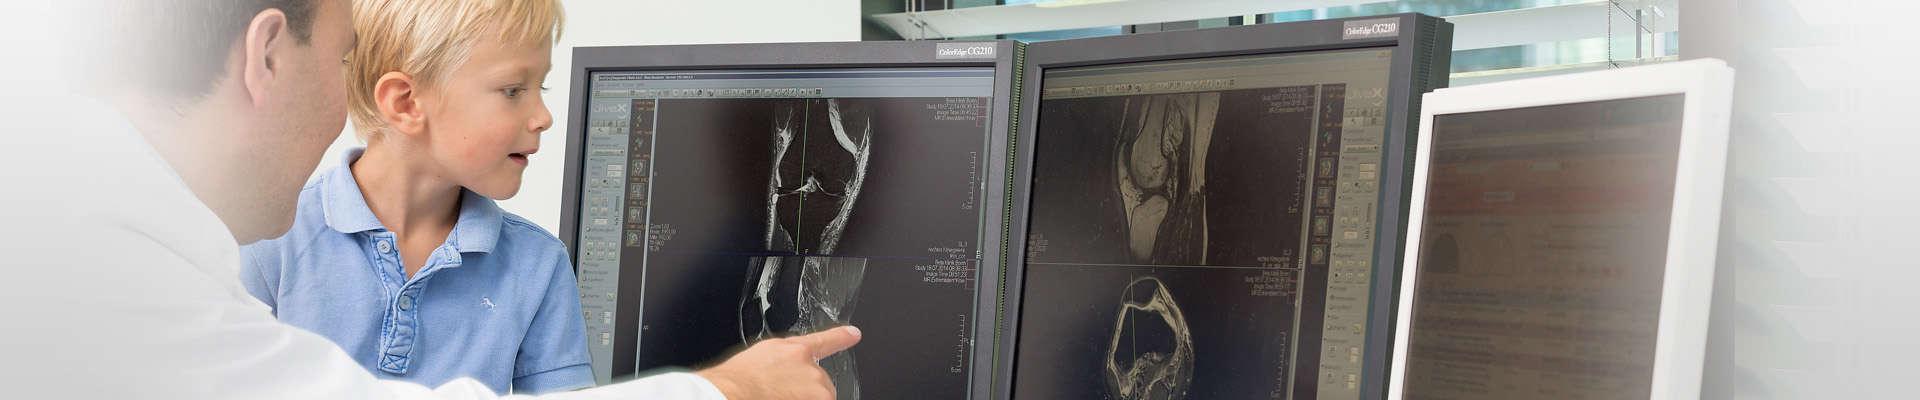 Radiologie-und-Kinderradiologie